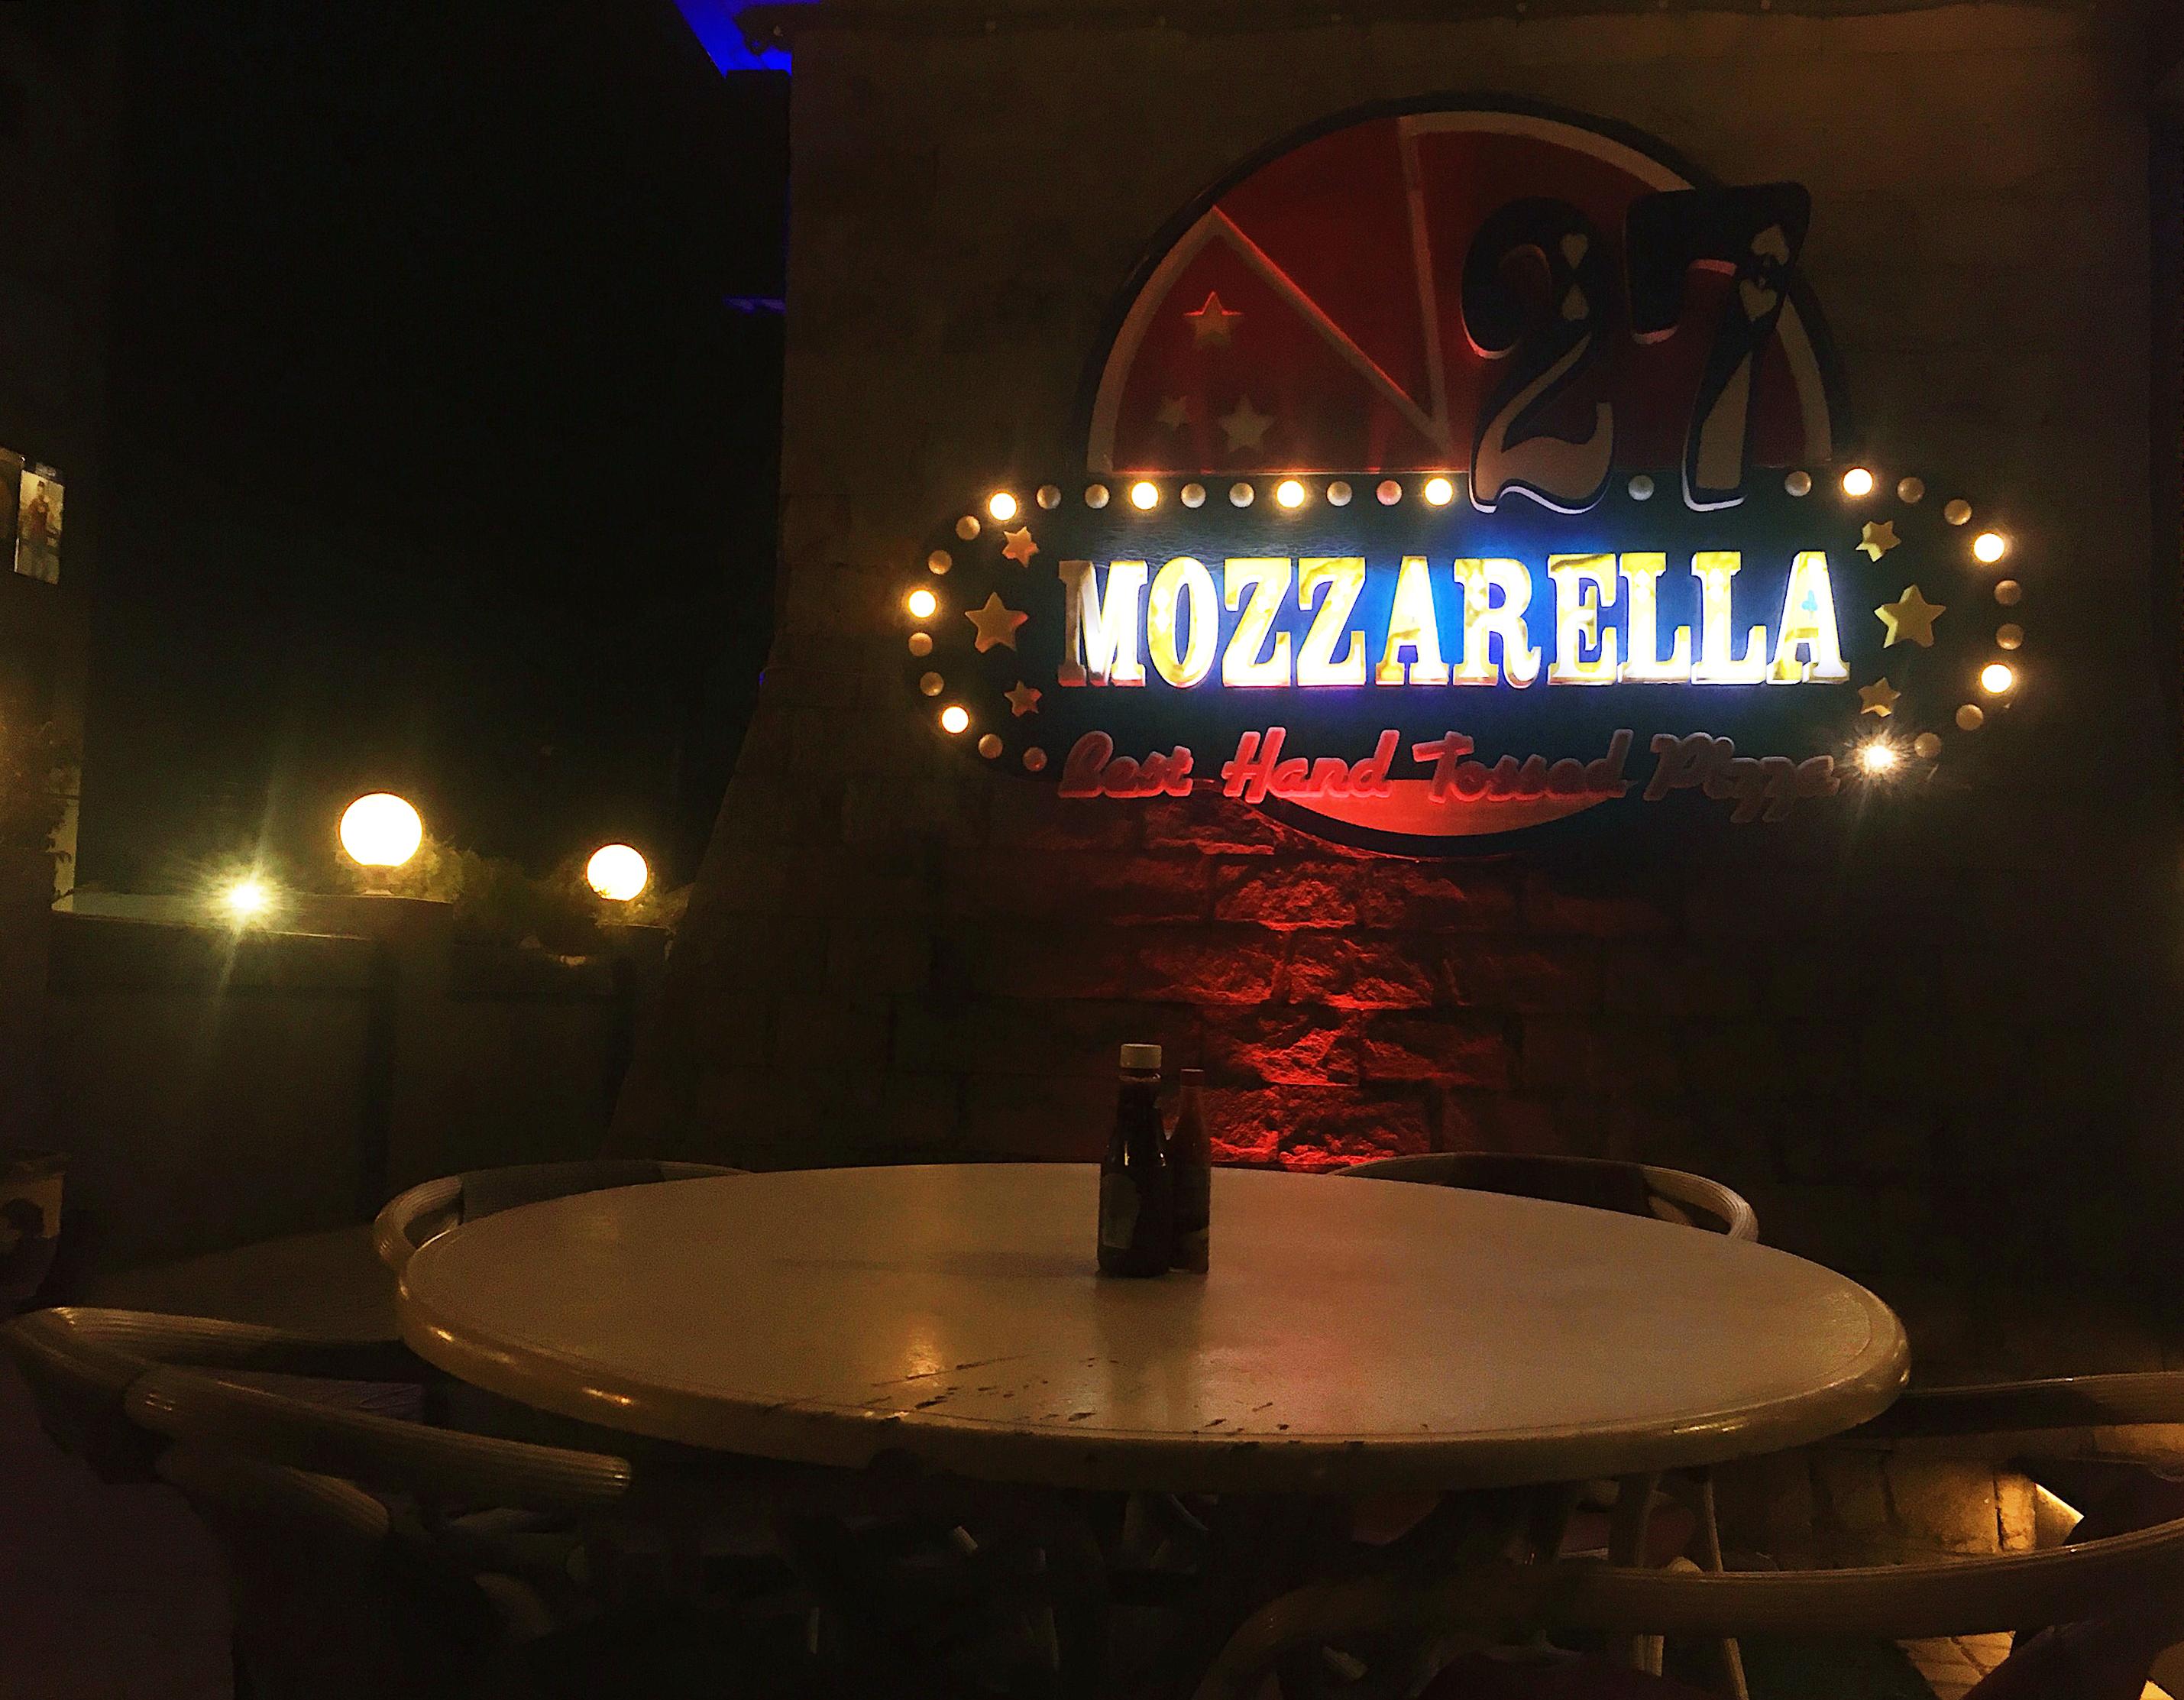 Edited 20 2 - Mozzarella 27: Topnotch Hodgepodge